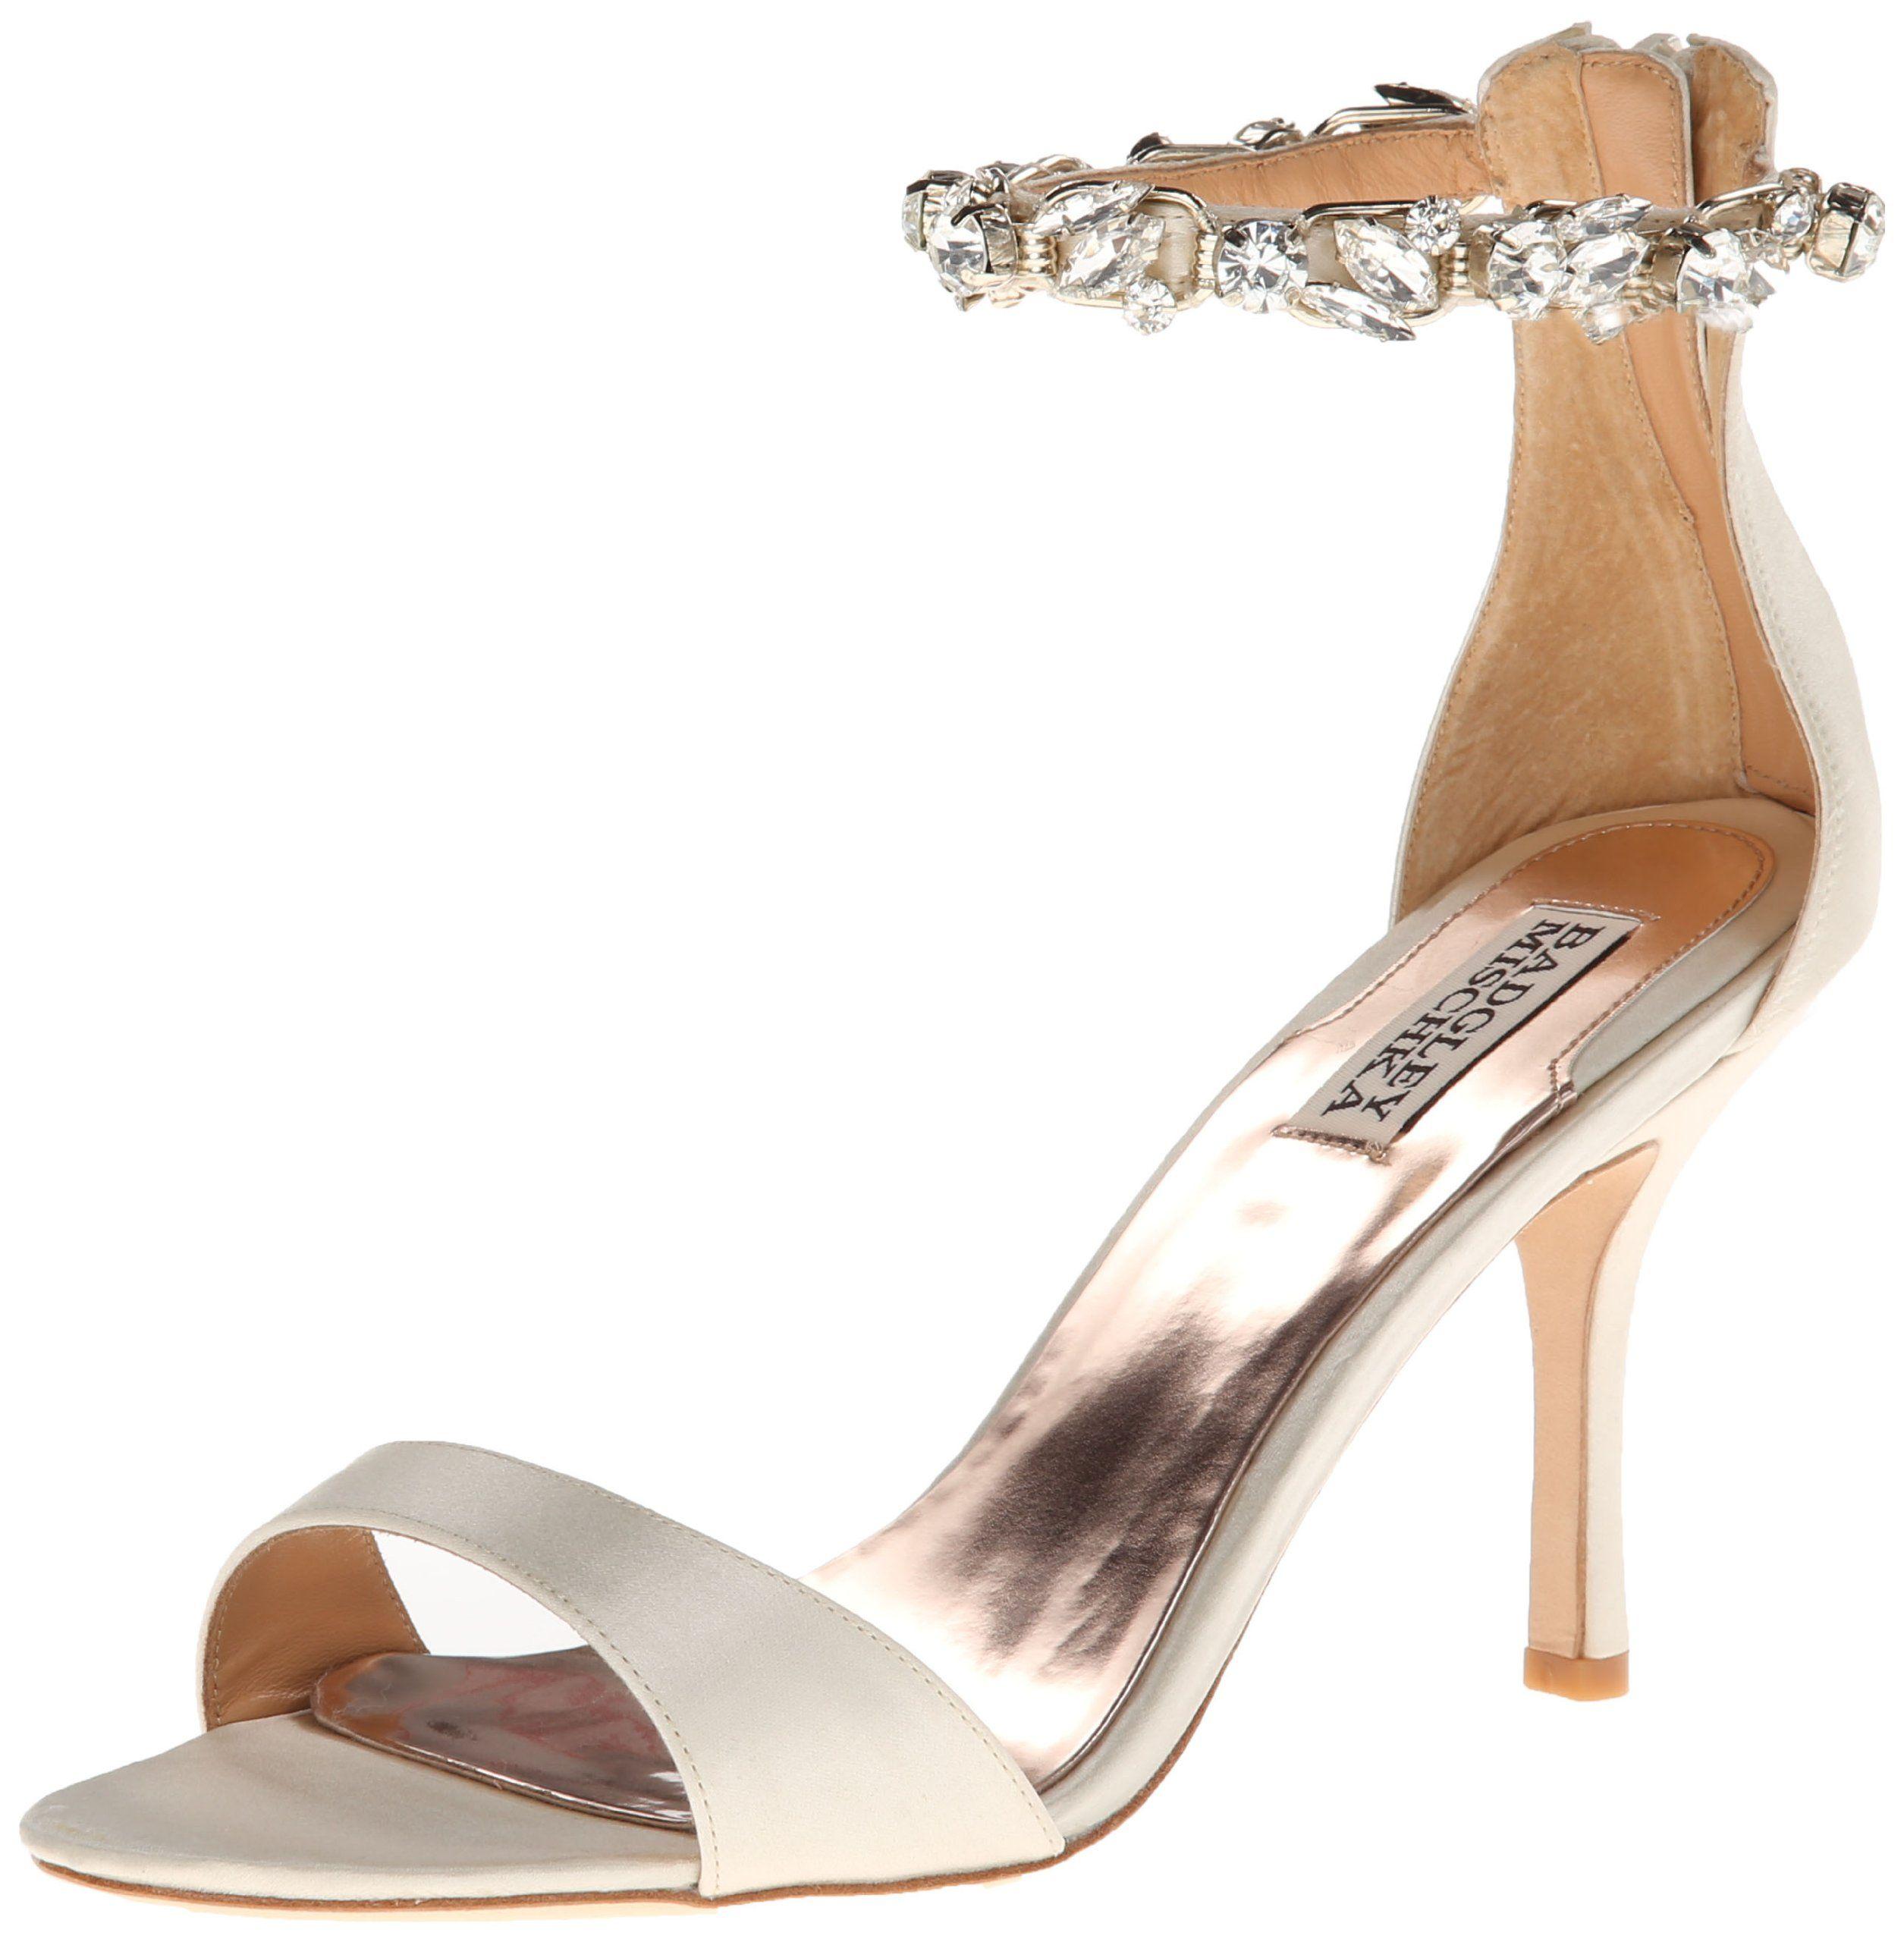 Zapatos formales Badgley Mischka para mujer xOxejV5Pw